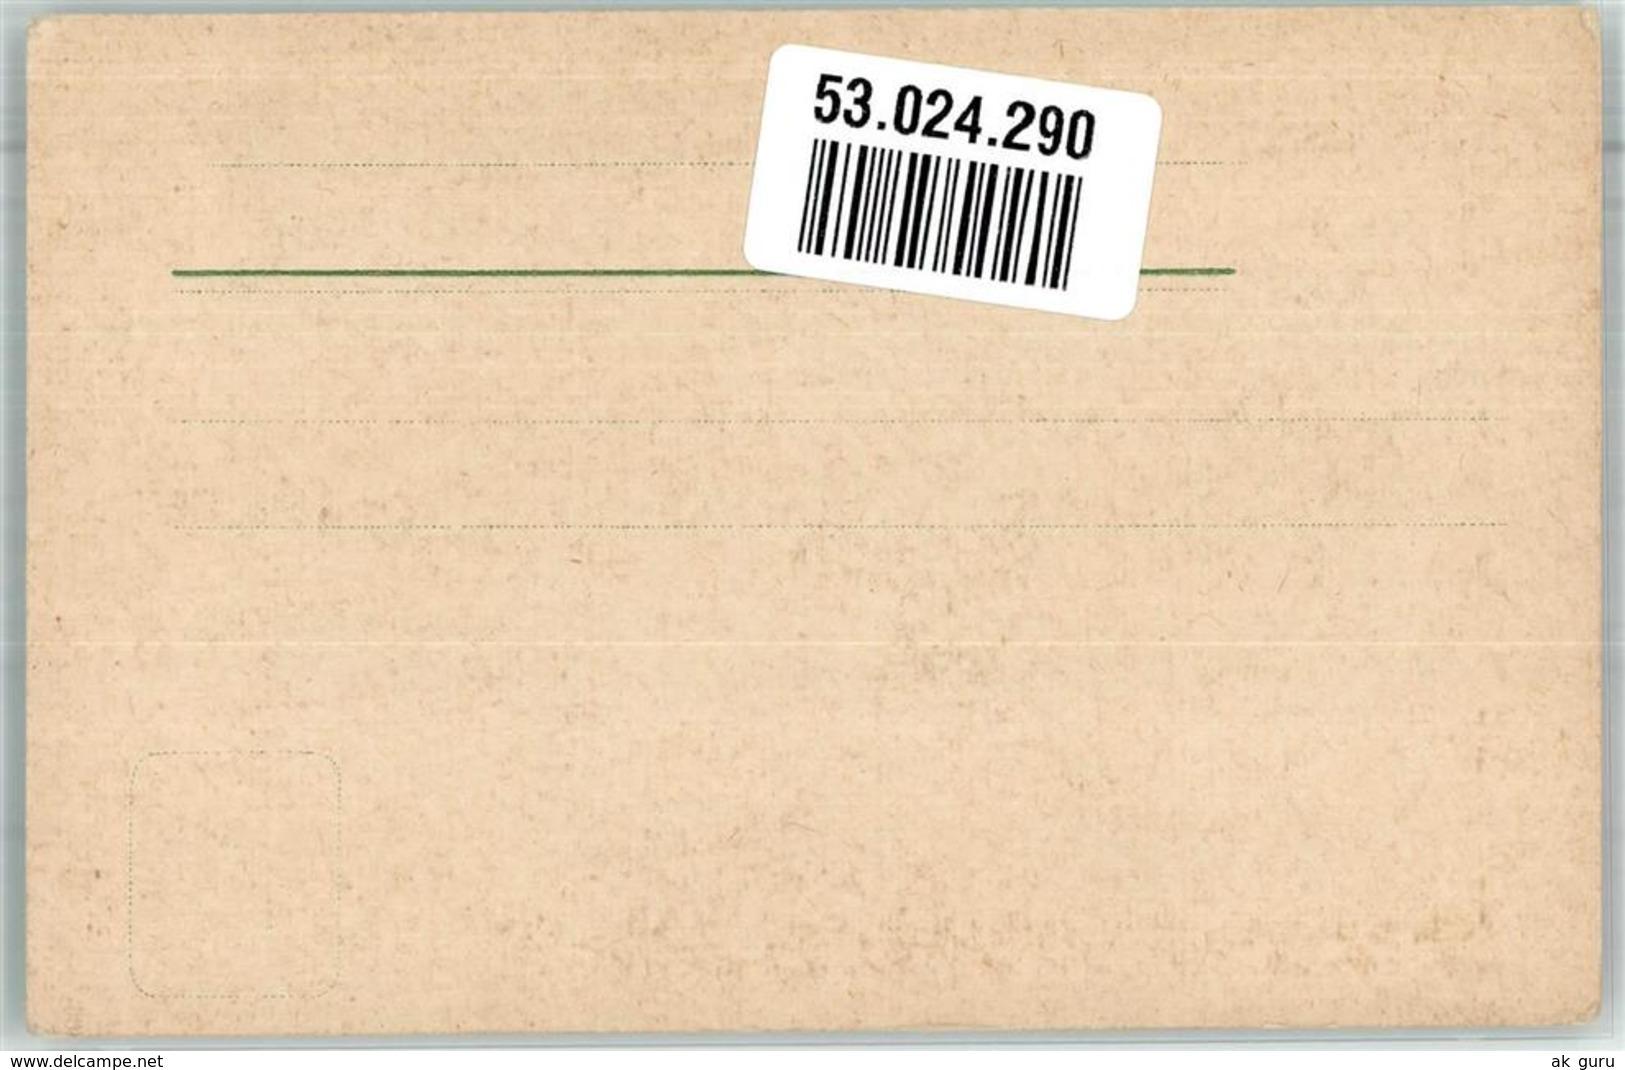 53024290 - - Illustrators & Photographers